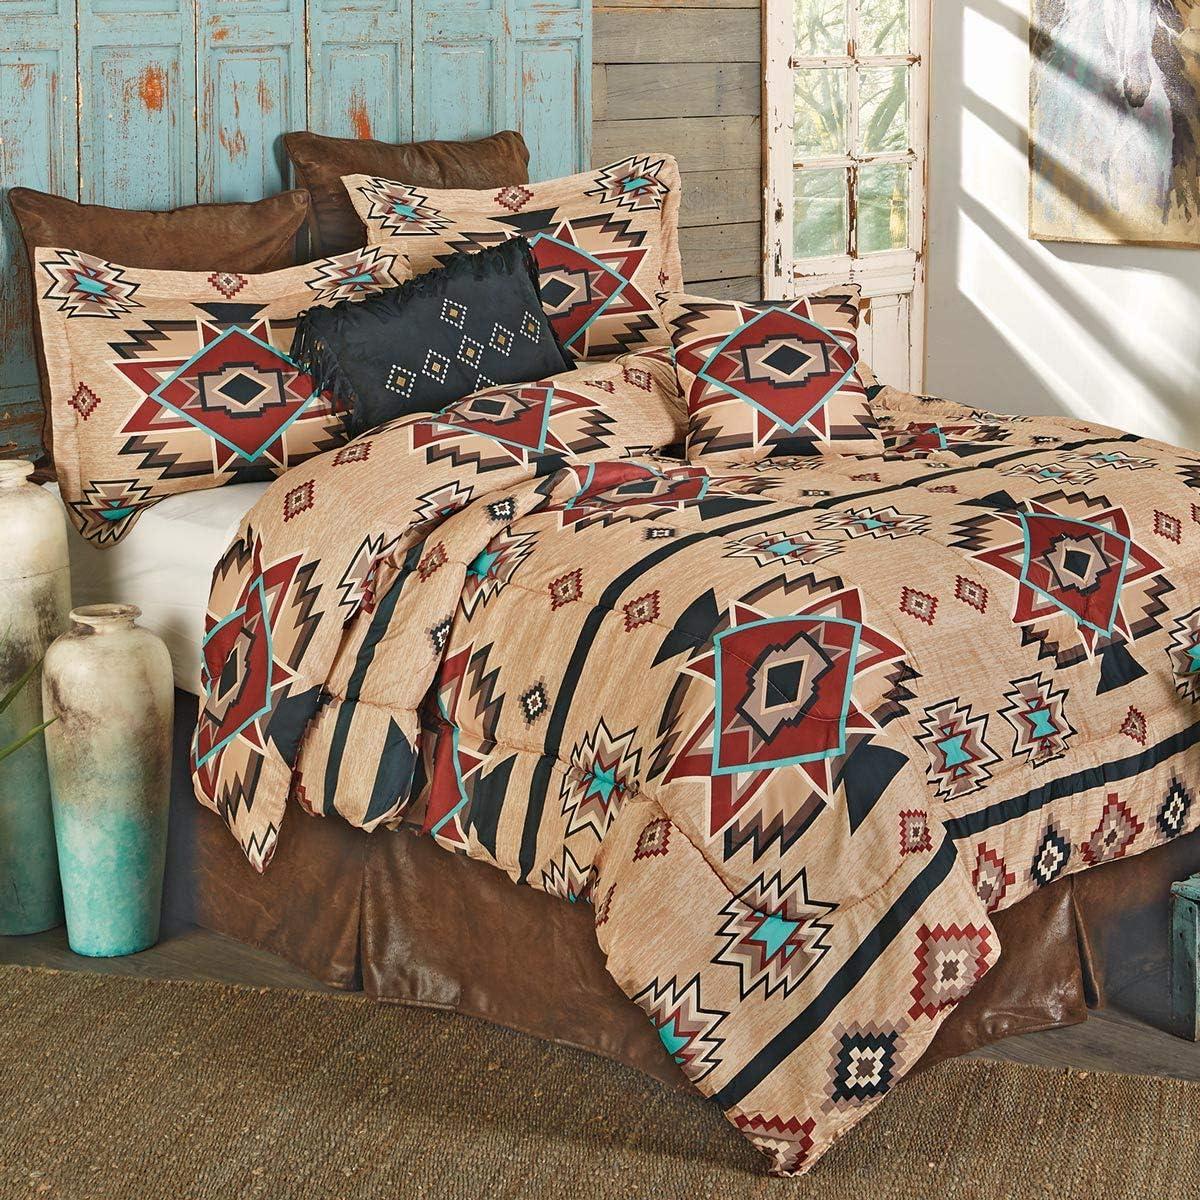 BLACK FOREST DECOR Sunset Trail Bed Set - King